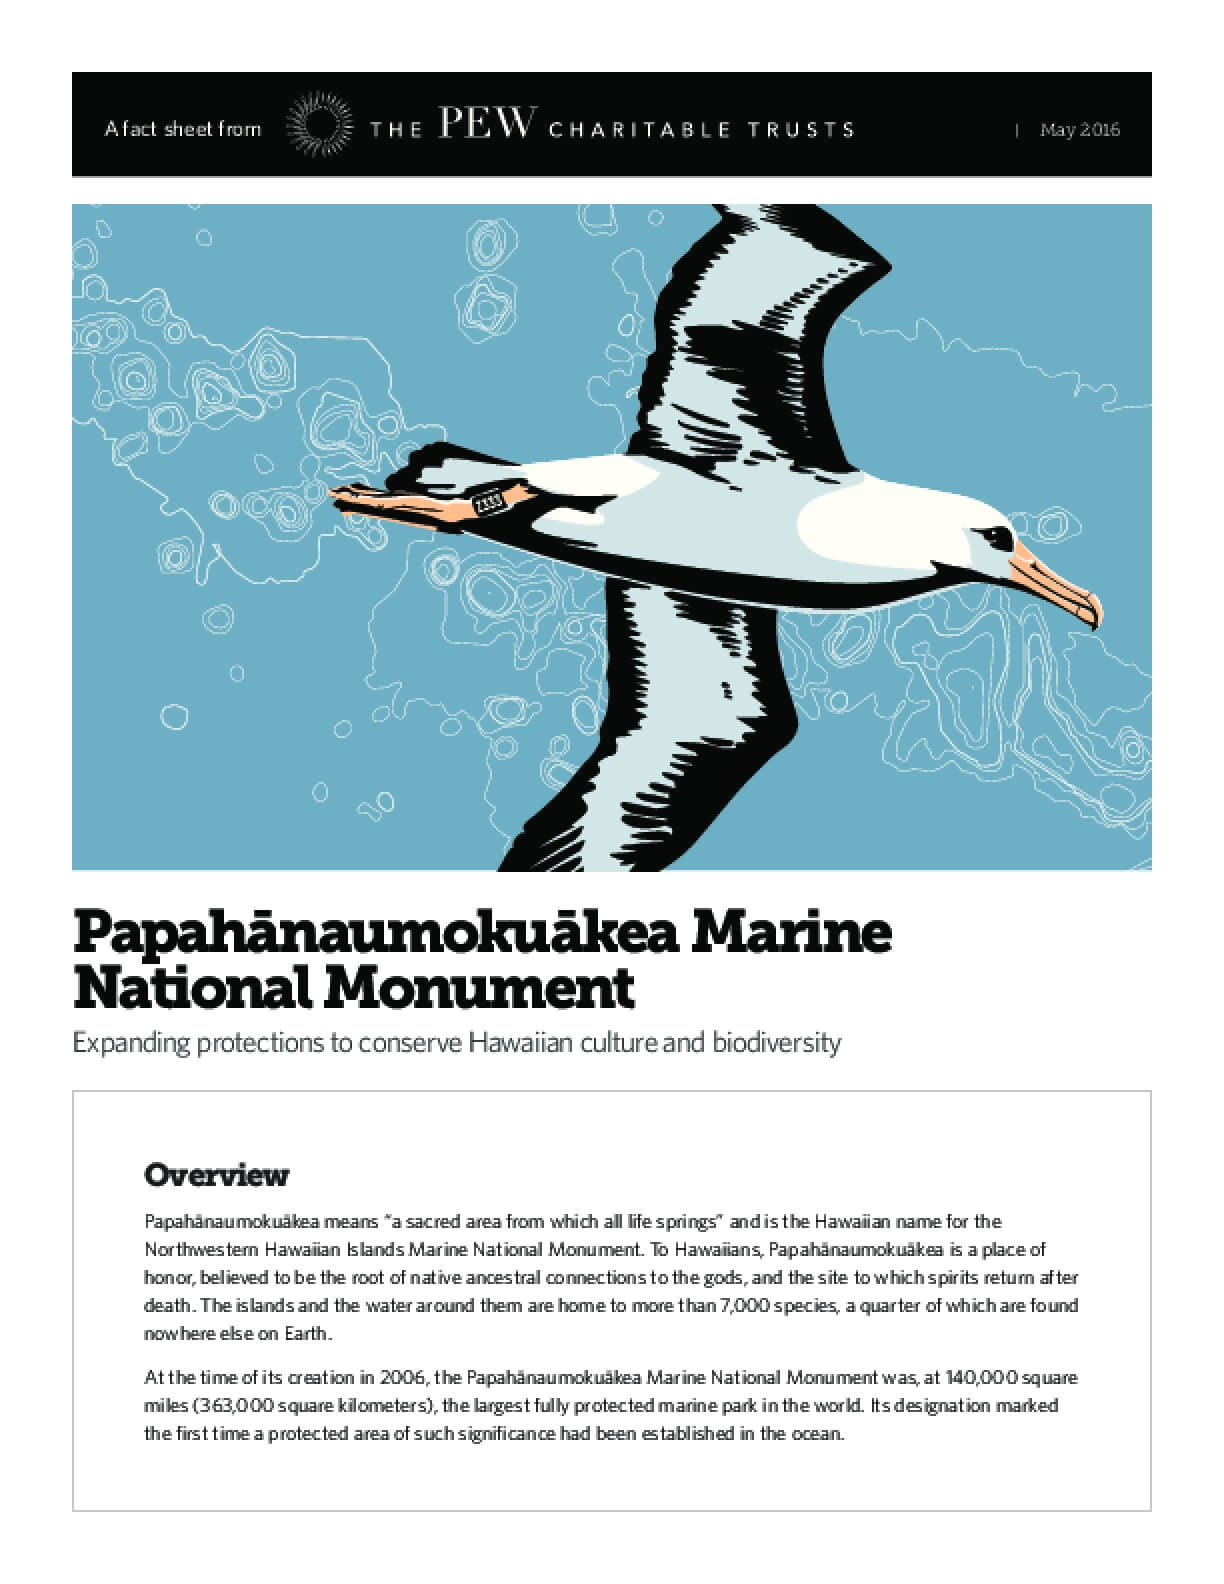 Papahānaumokuākea Marine National Monument Expanding Protections to Conserve Hawaiian Culture and Biodiversity